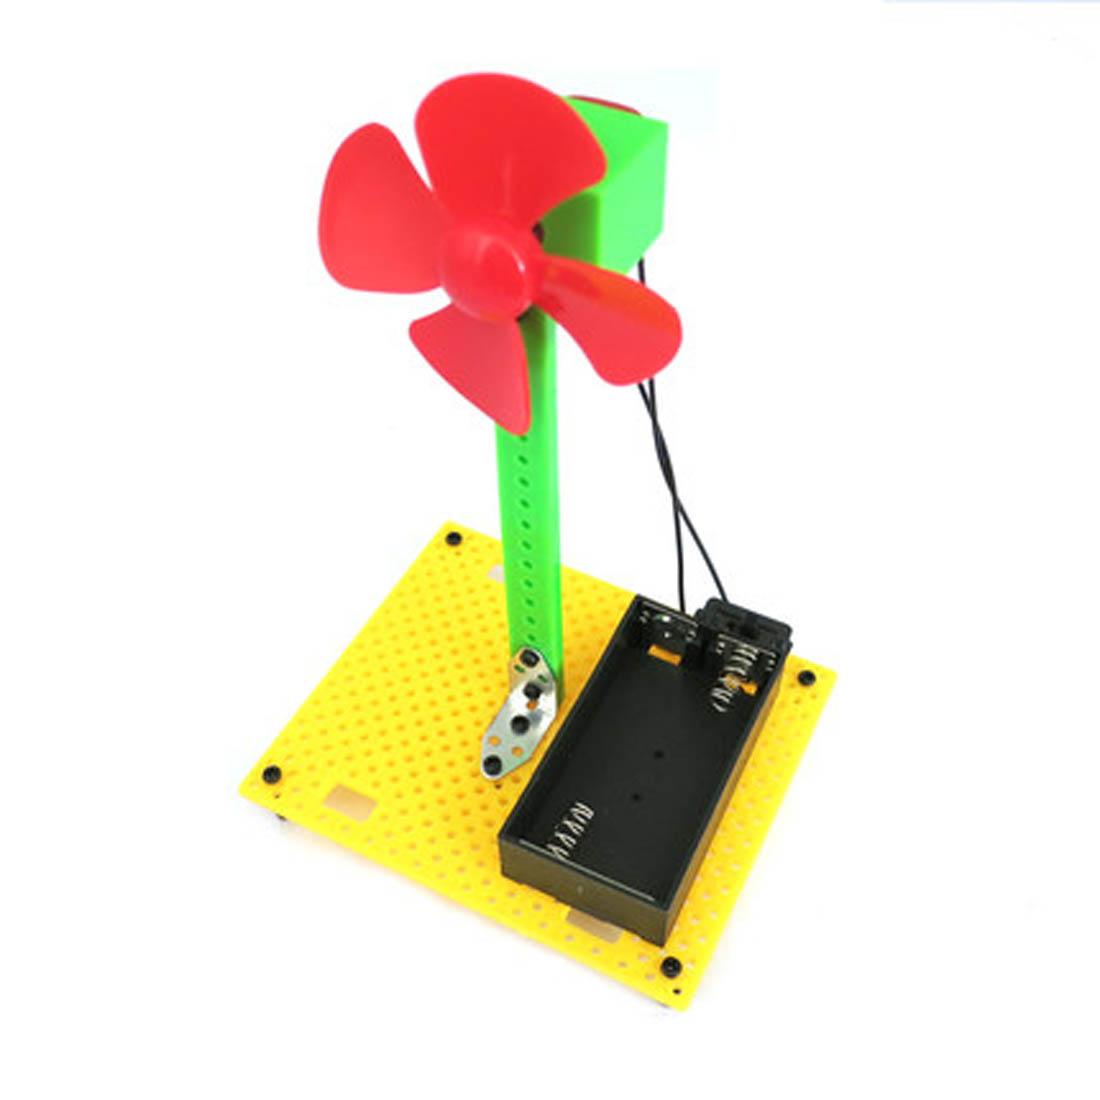 diy风扇 手工科技小制作 电动模型拼装玩具 科学实验小发明材料包